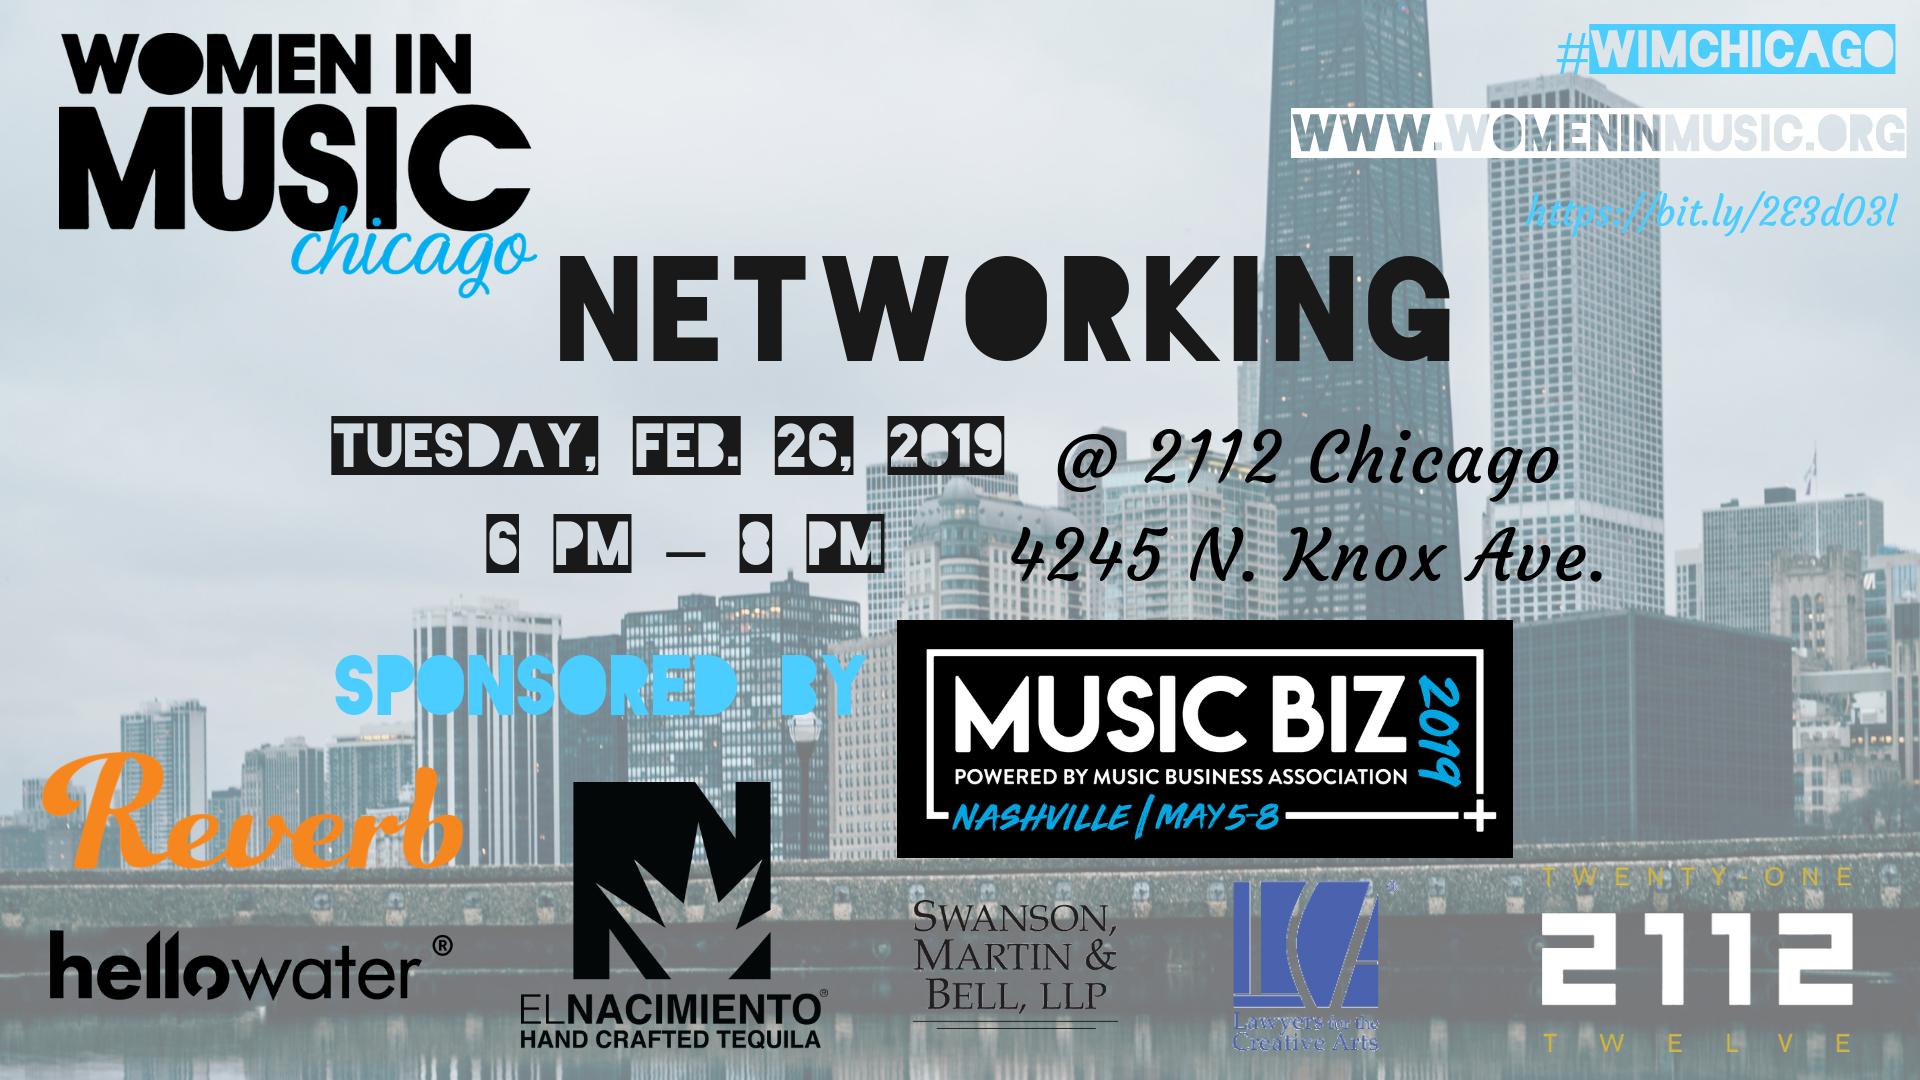 Women In Music Chicago - Networking